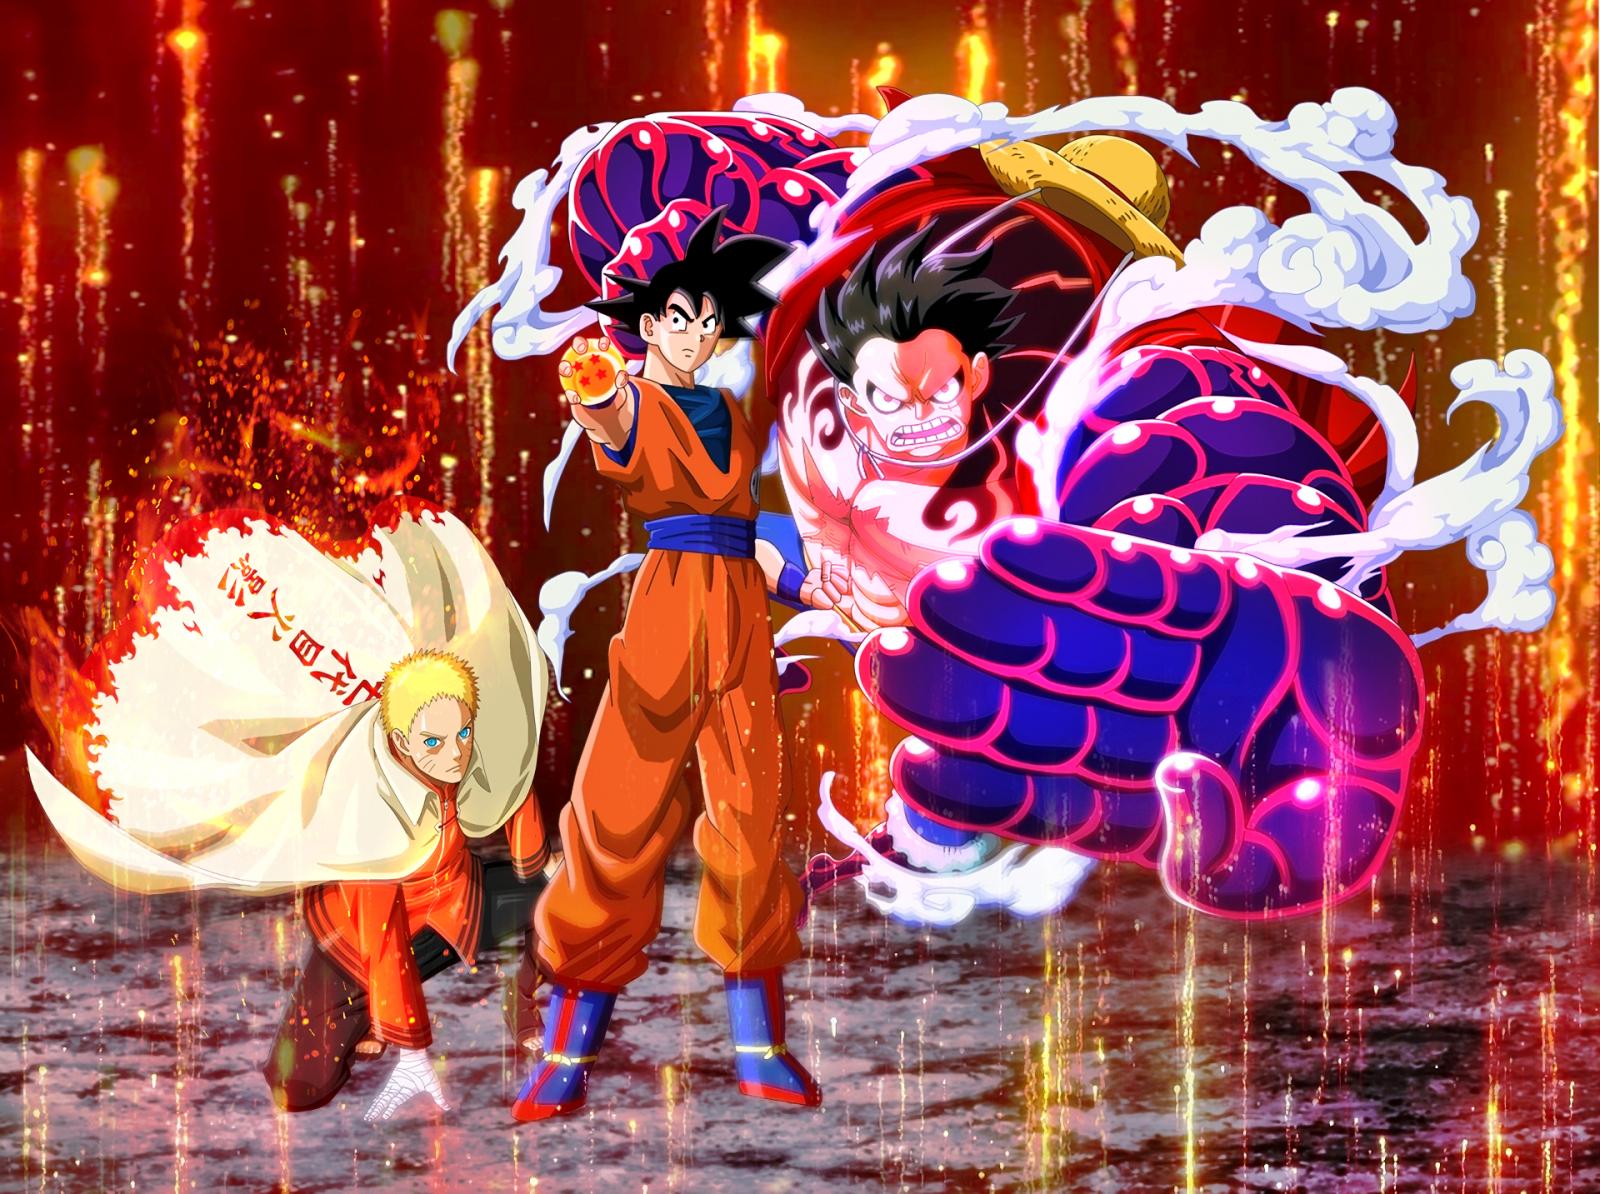 Fond d'écran : Crossover, Son Goku, Monkey D Luffy, Uzumaki Naruto 1920x1433 - danielgreen ...